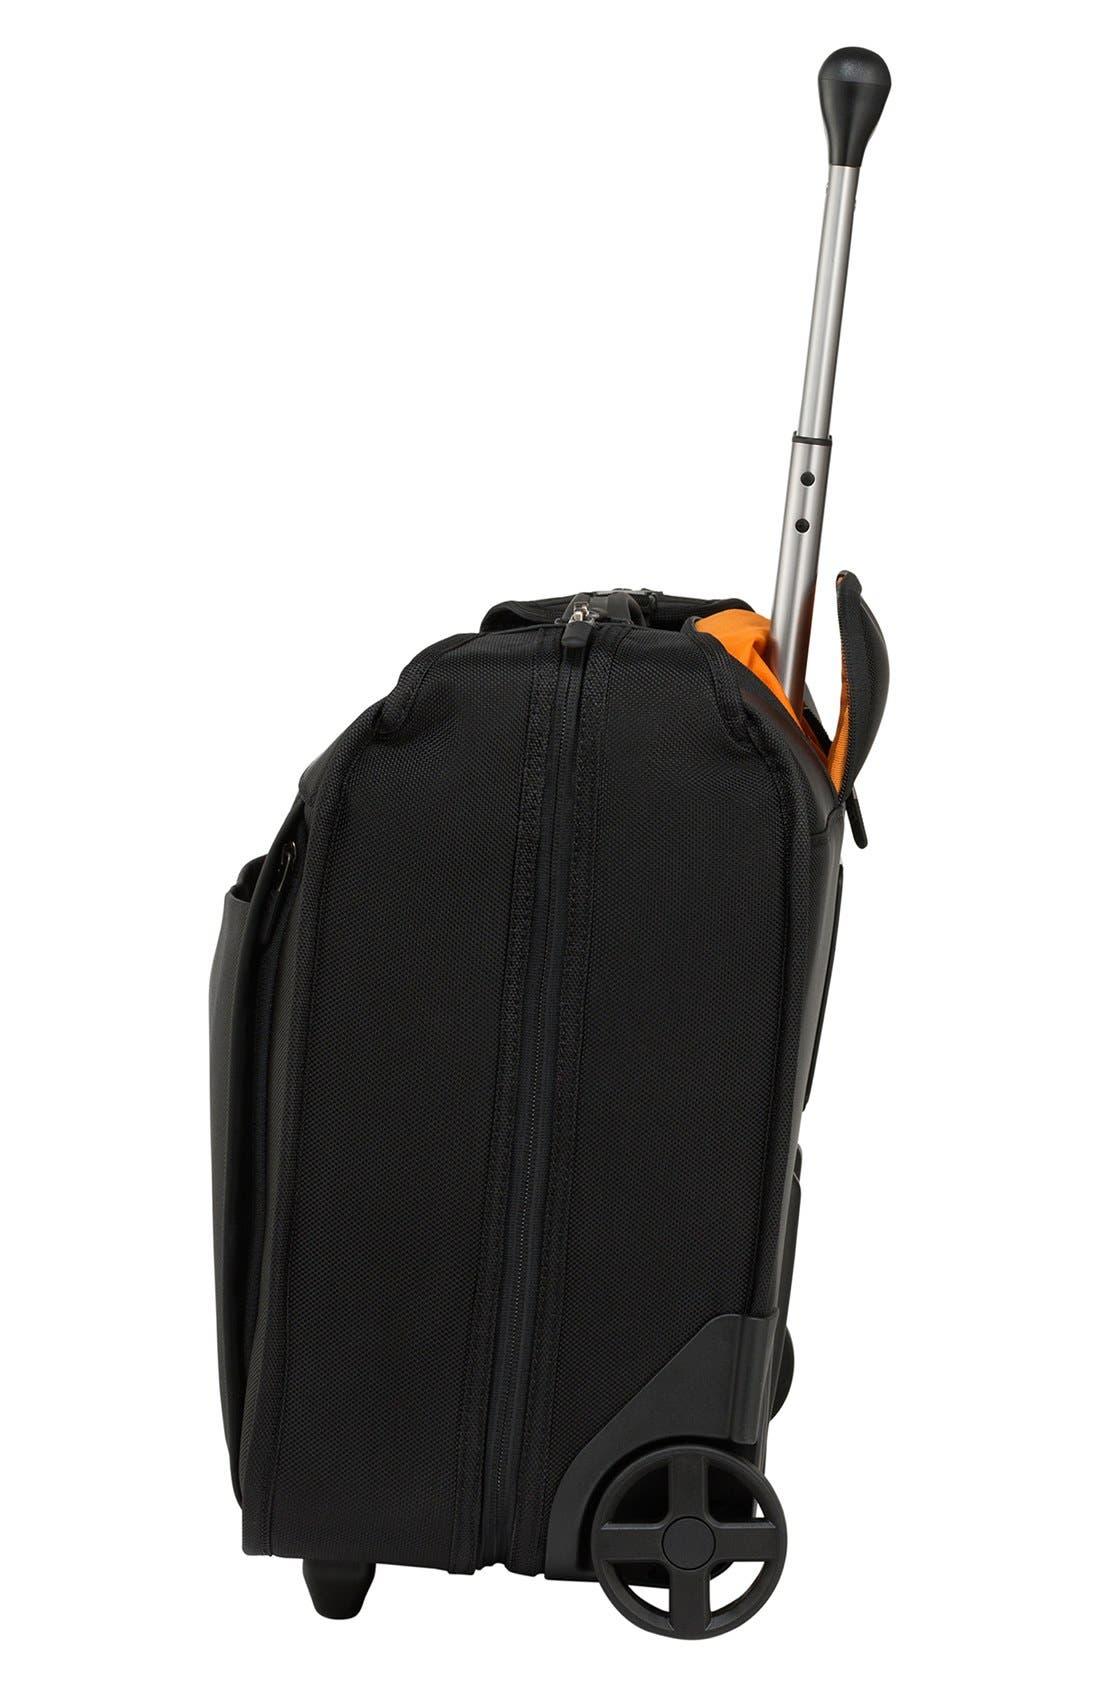 WT 5.0 - East/West Wheeled Garment Bag,                             Alternate thumbnail 2, color,                             001